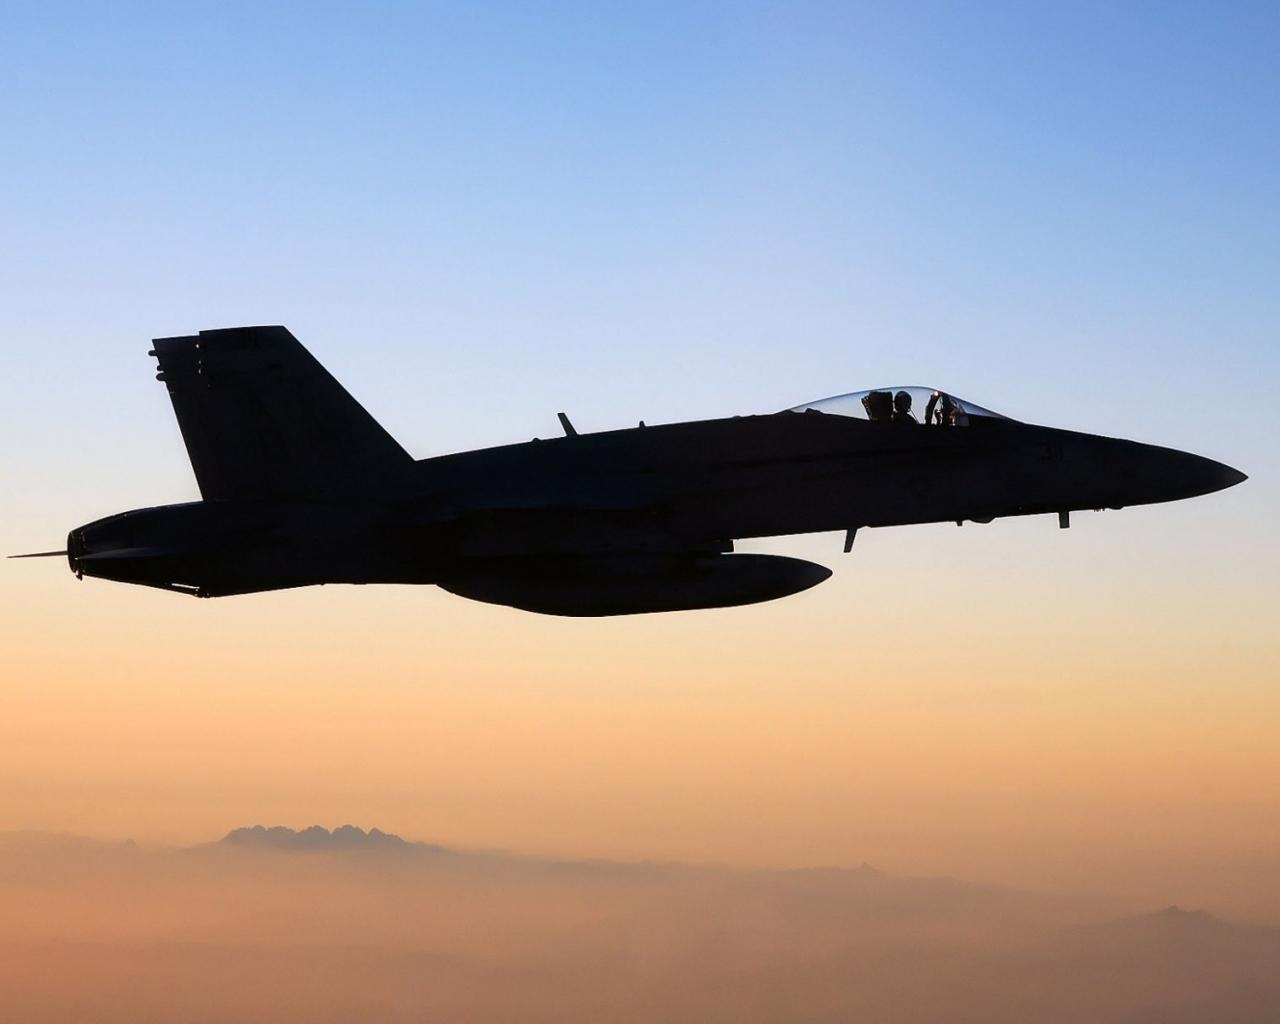 FA-18 Hornet - 1280x1024